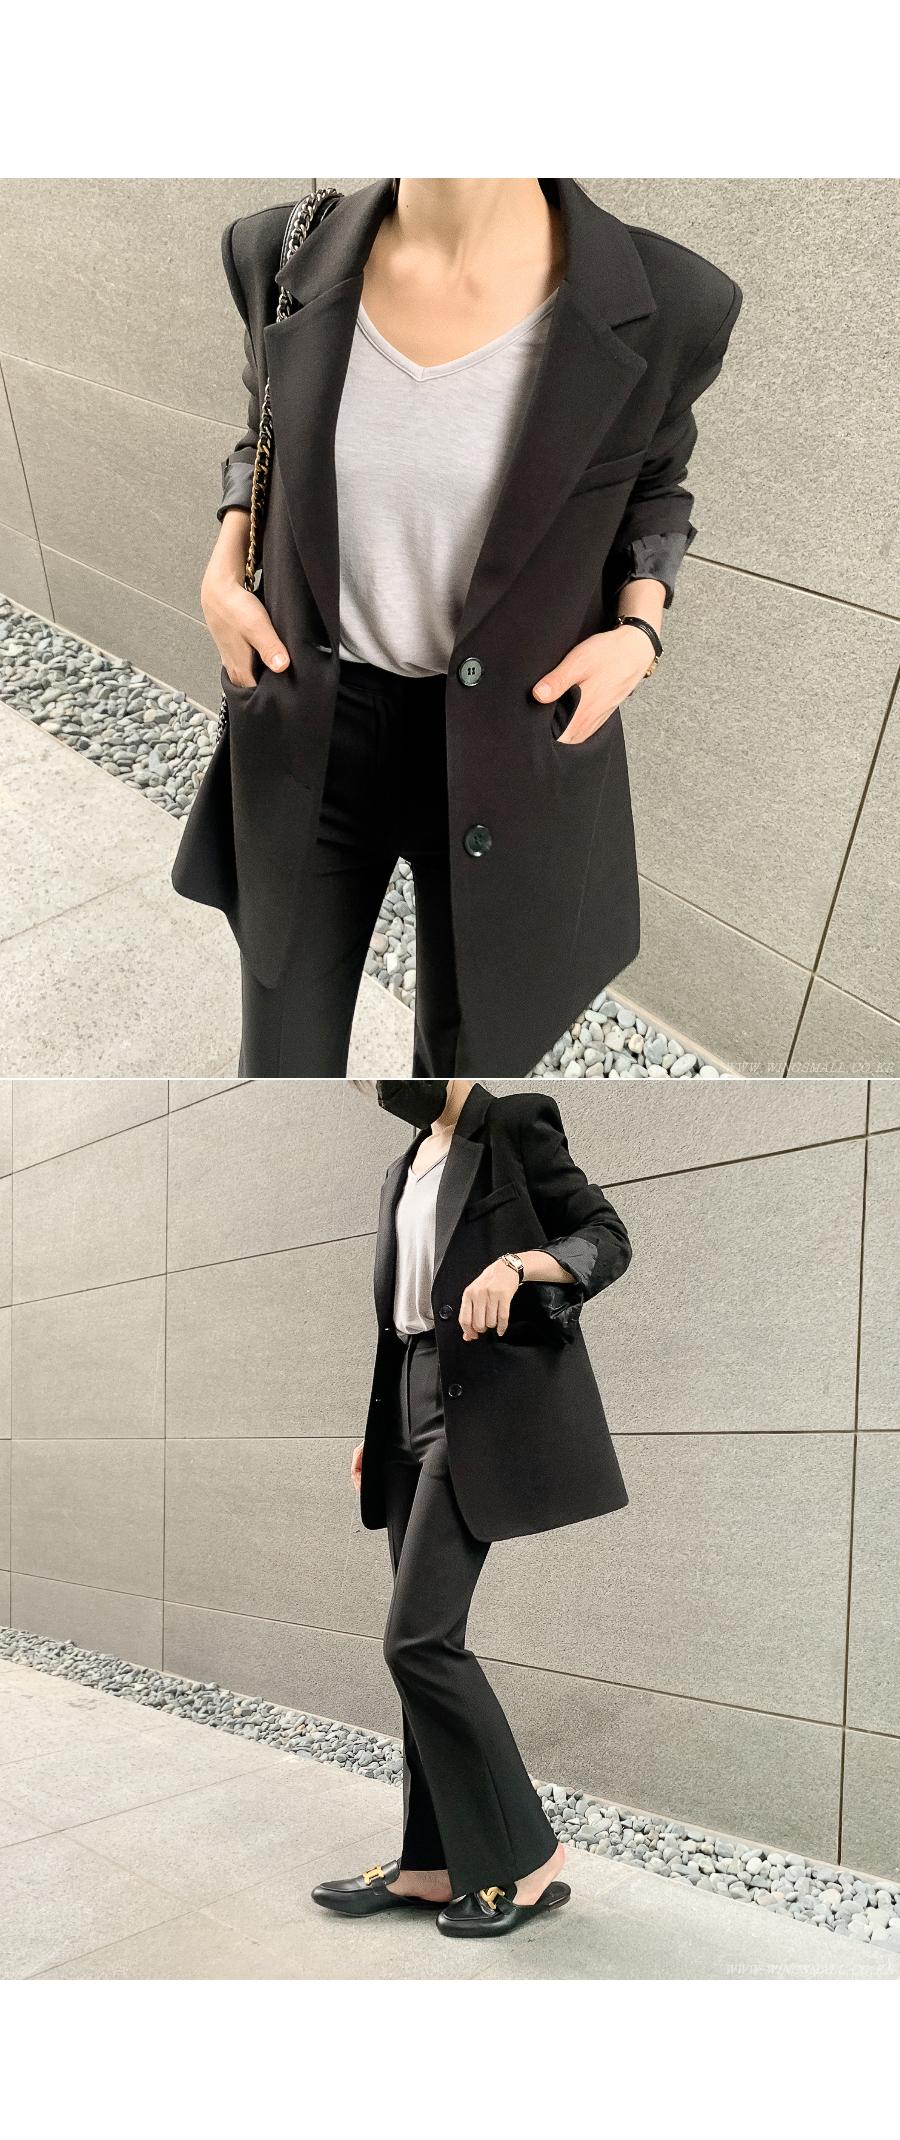 dress model image-S26L11